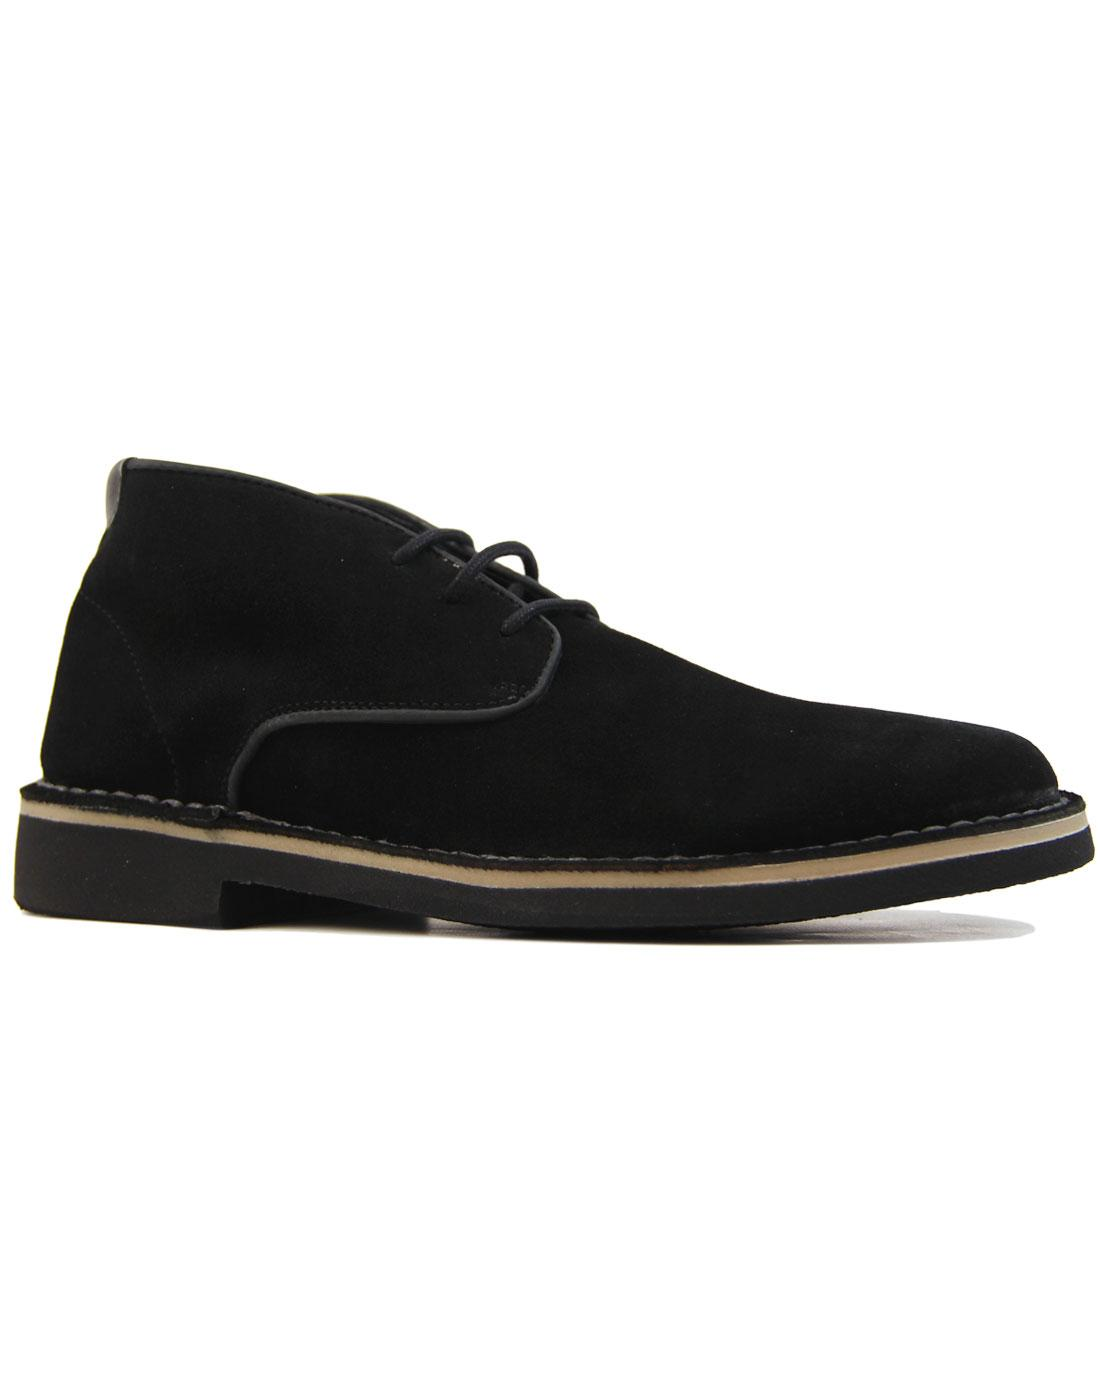 Margrey HUDSON Mod Leather Trim Suede Desert Boots